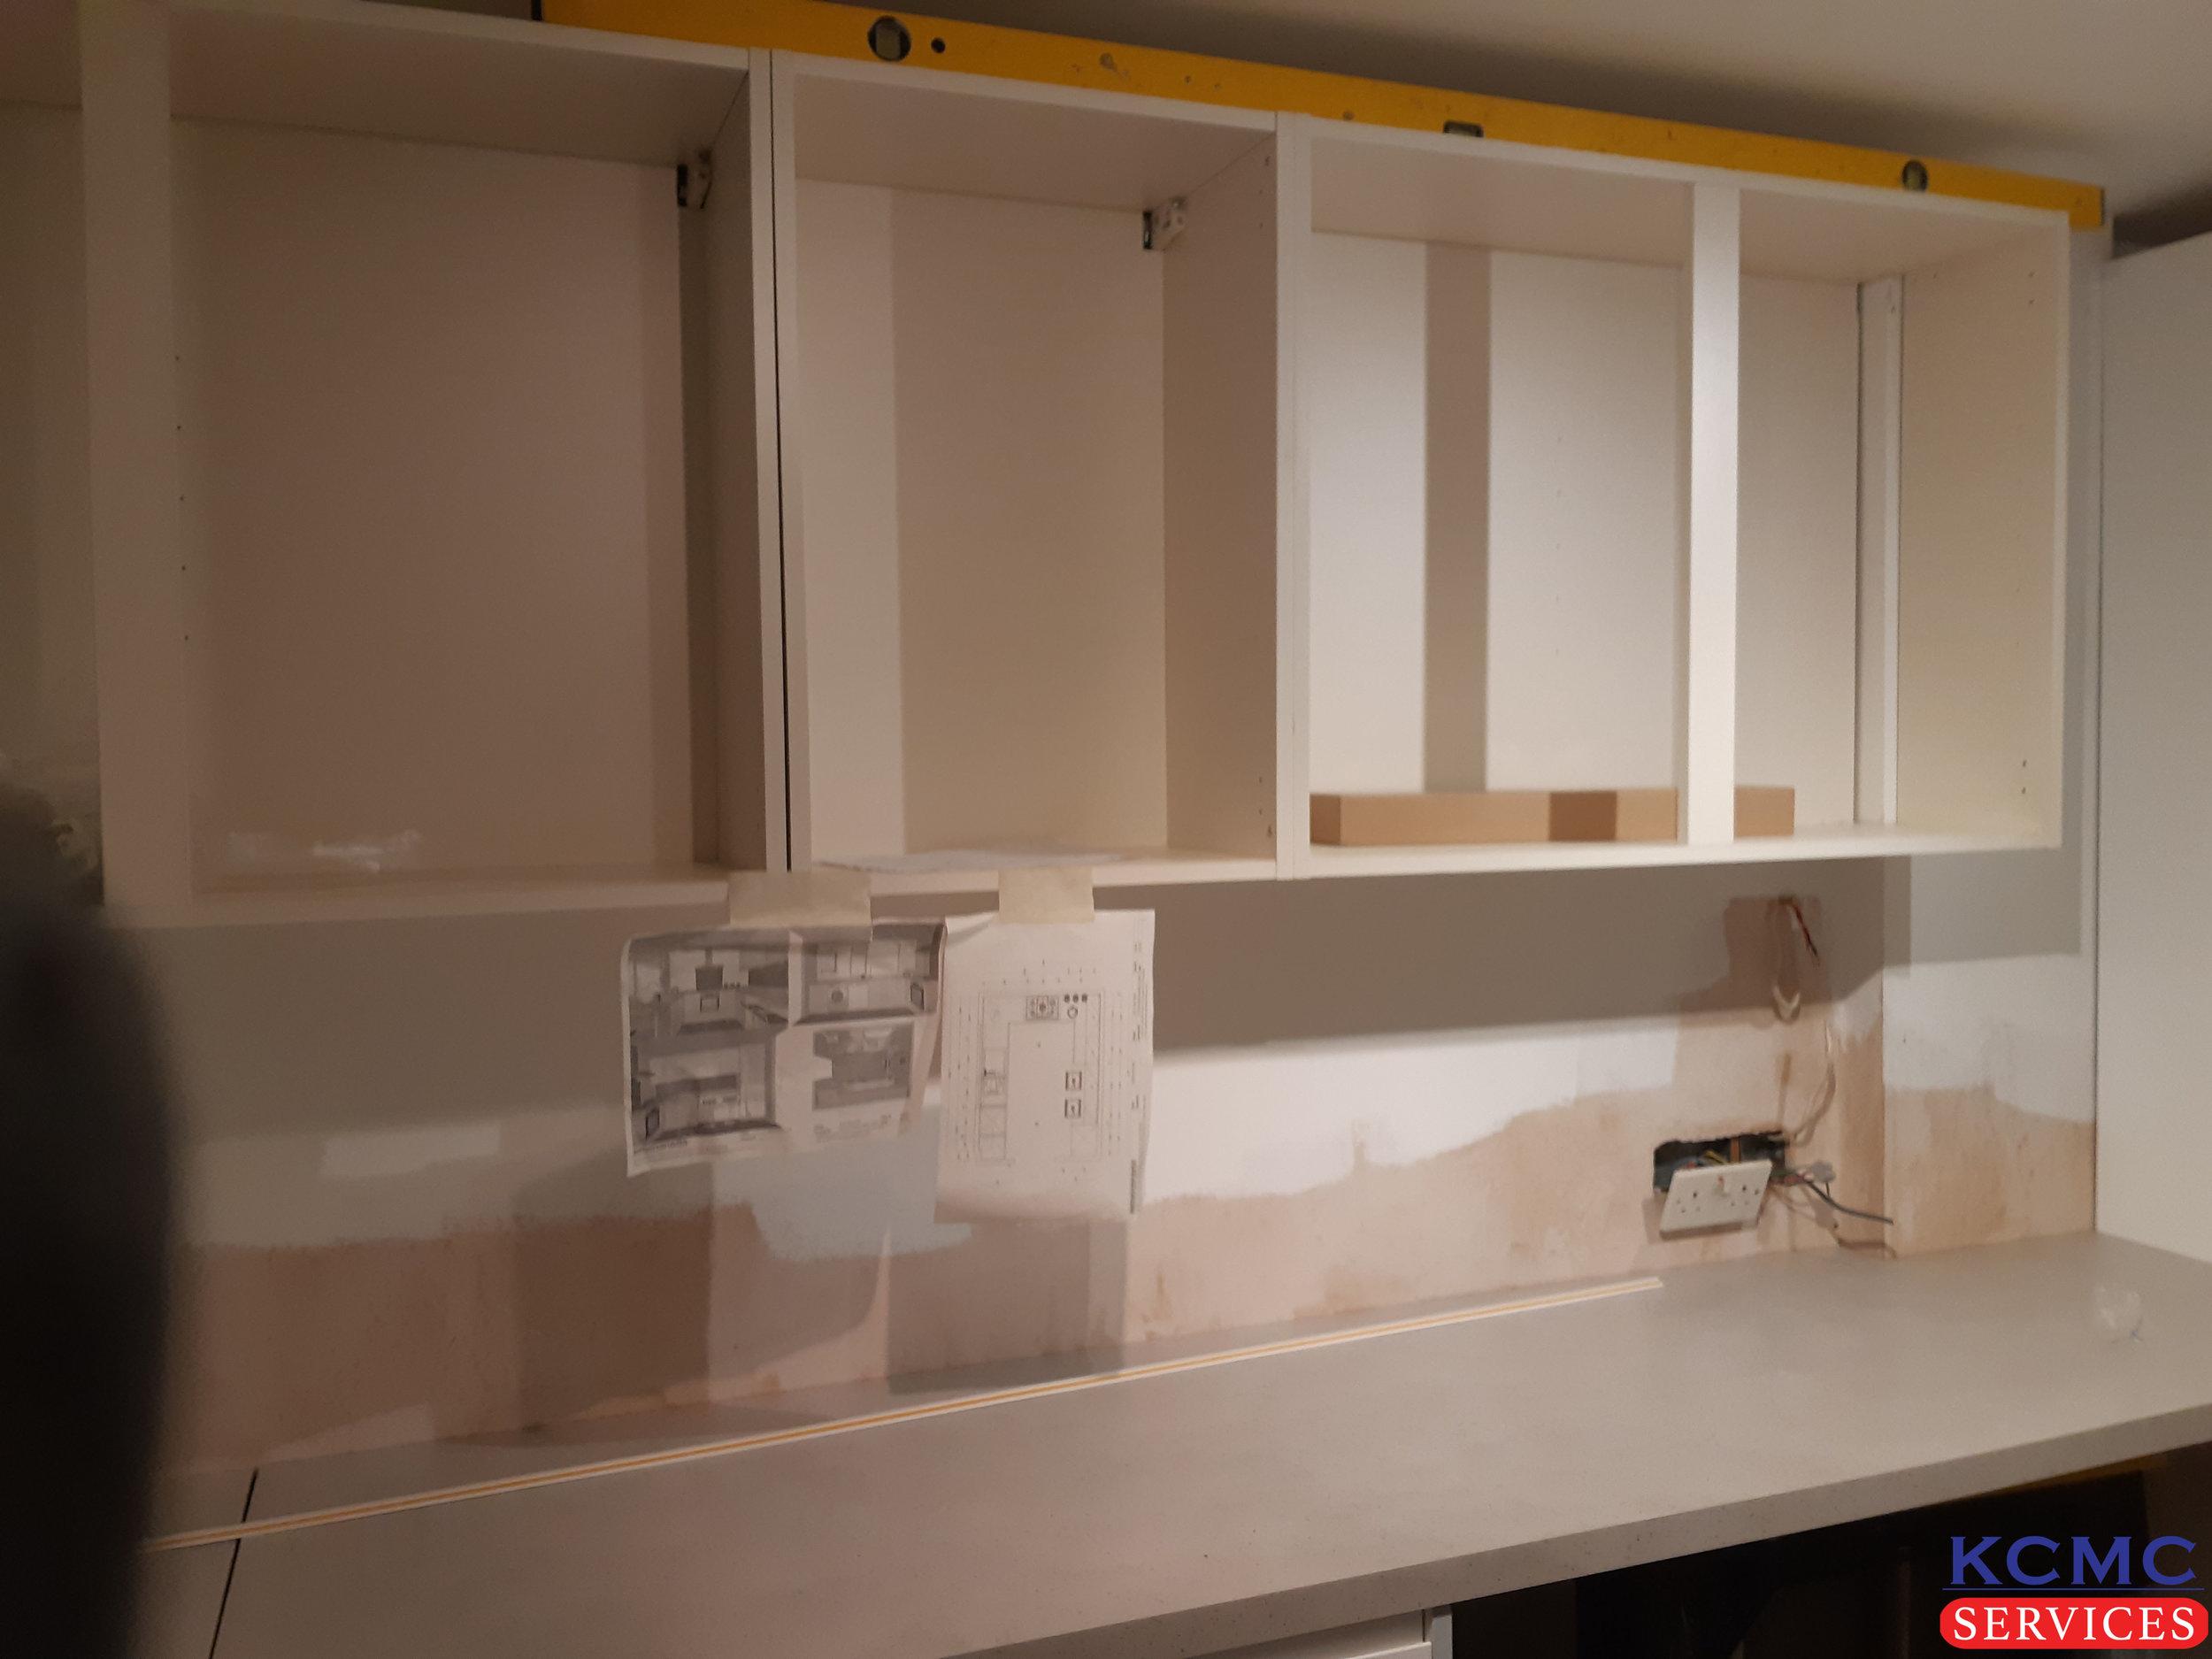 KCMC Services kitchen install